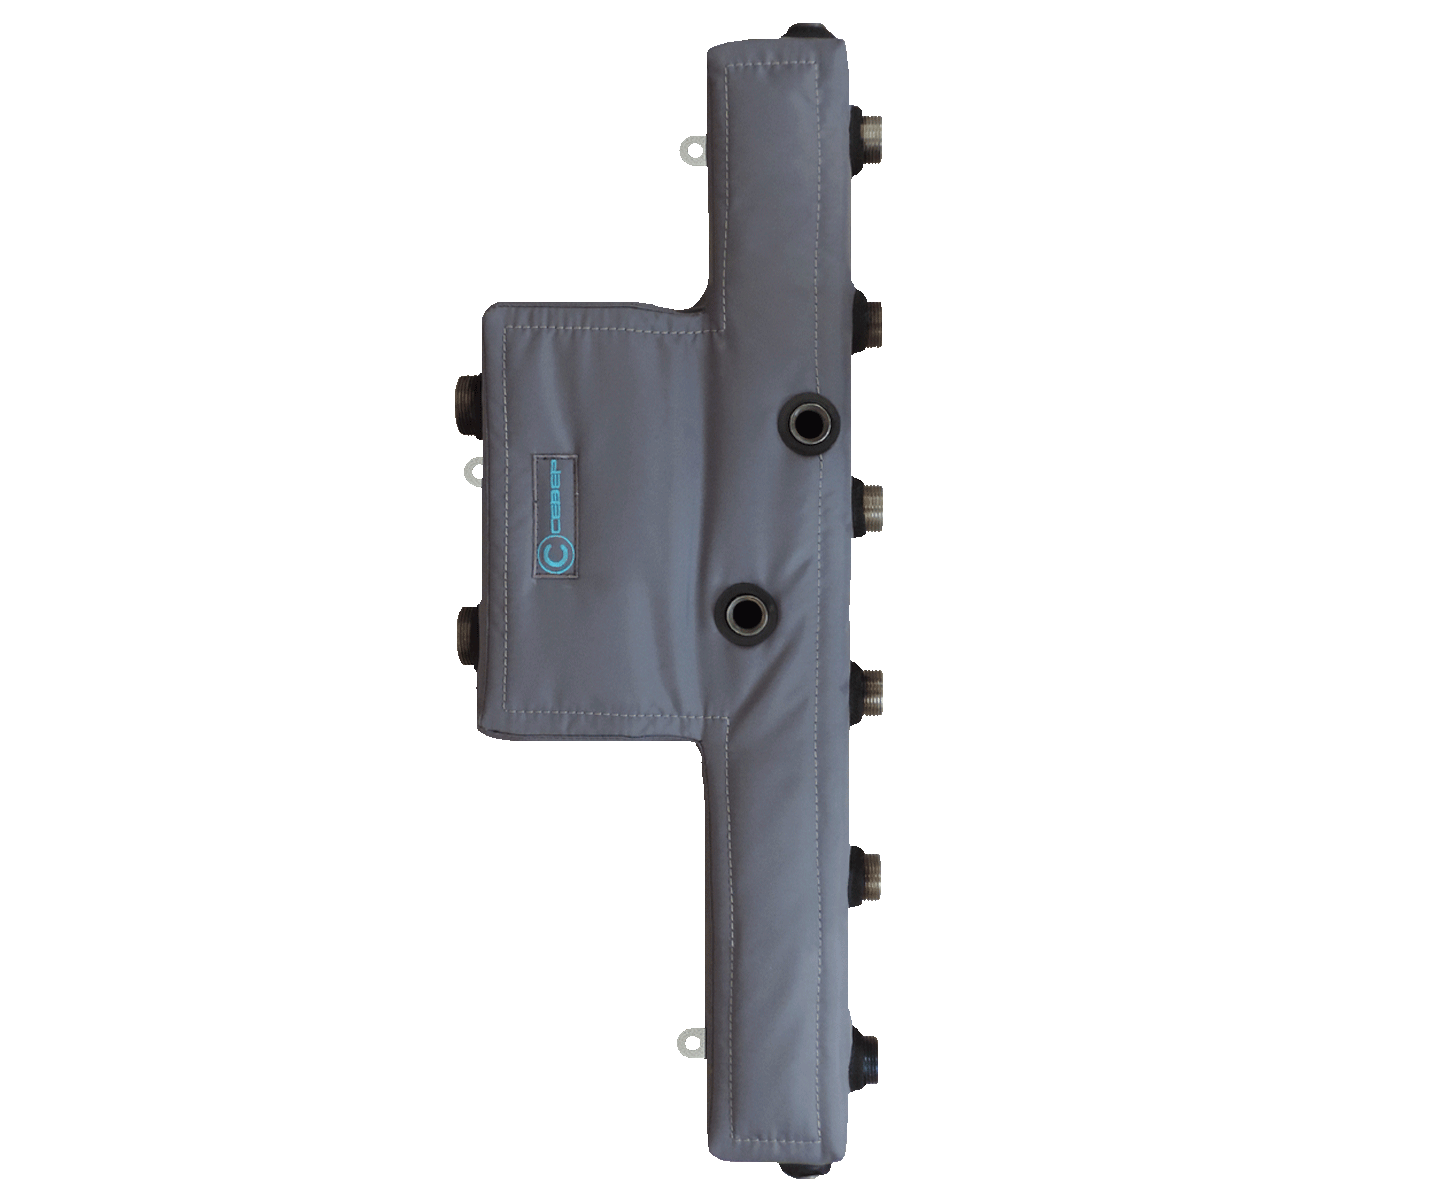 Теплоизоляция, теплоизоляционный чехол для гидрообвязки Север V3